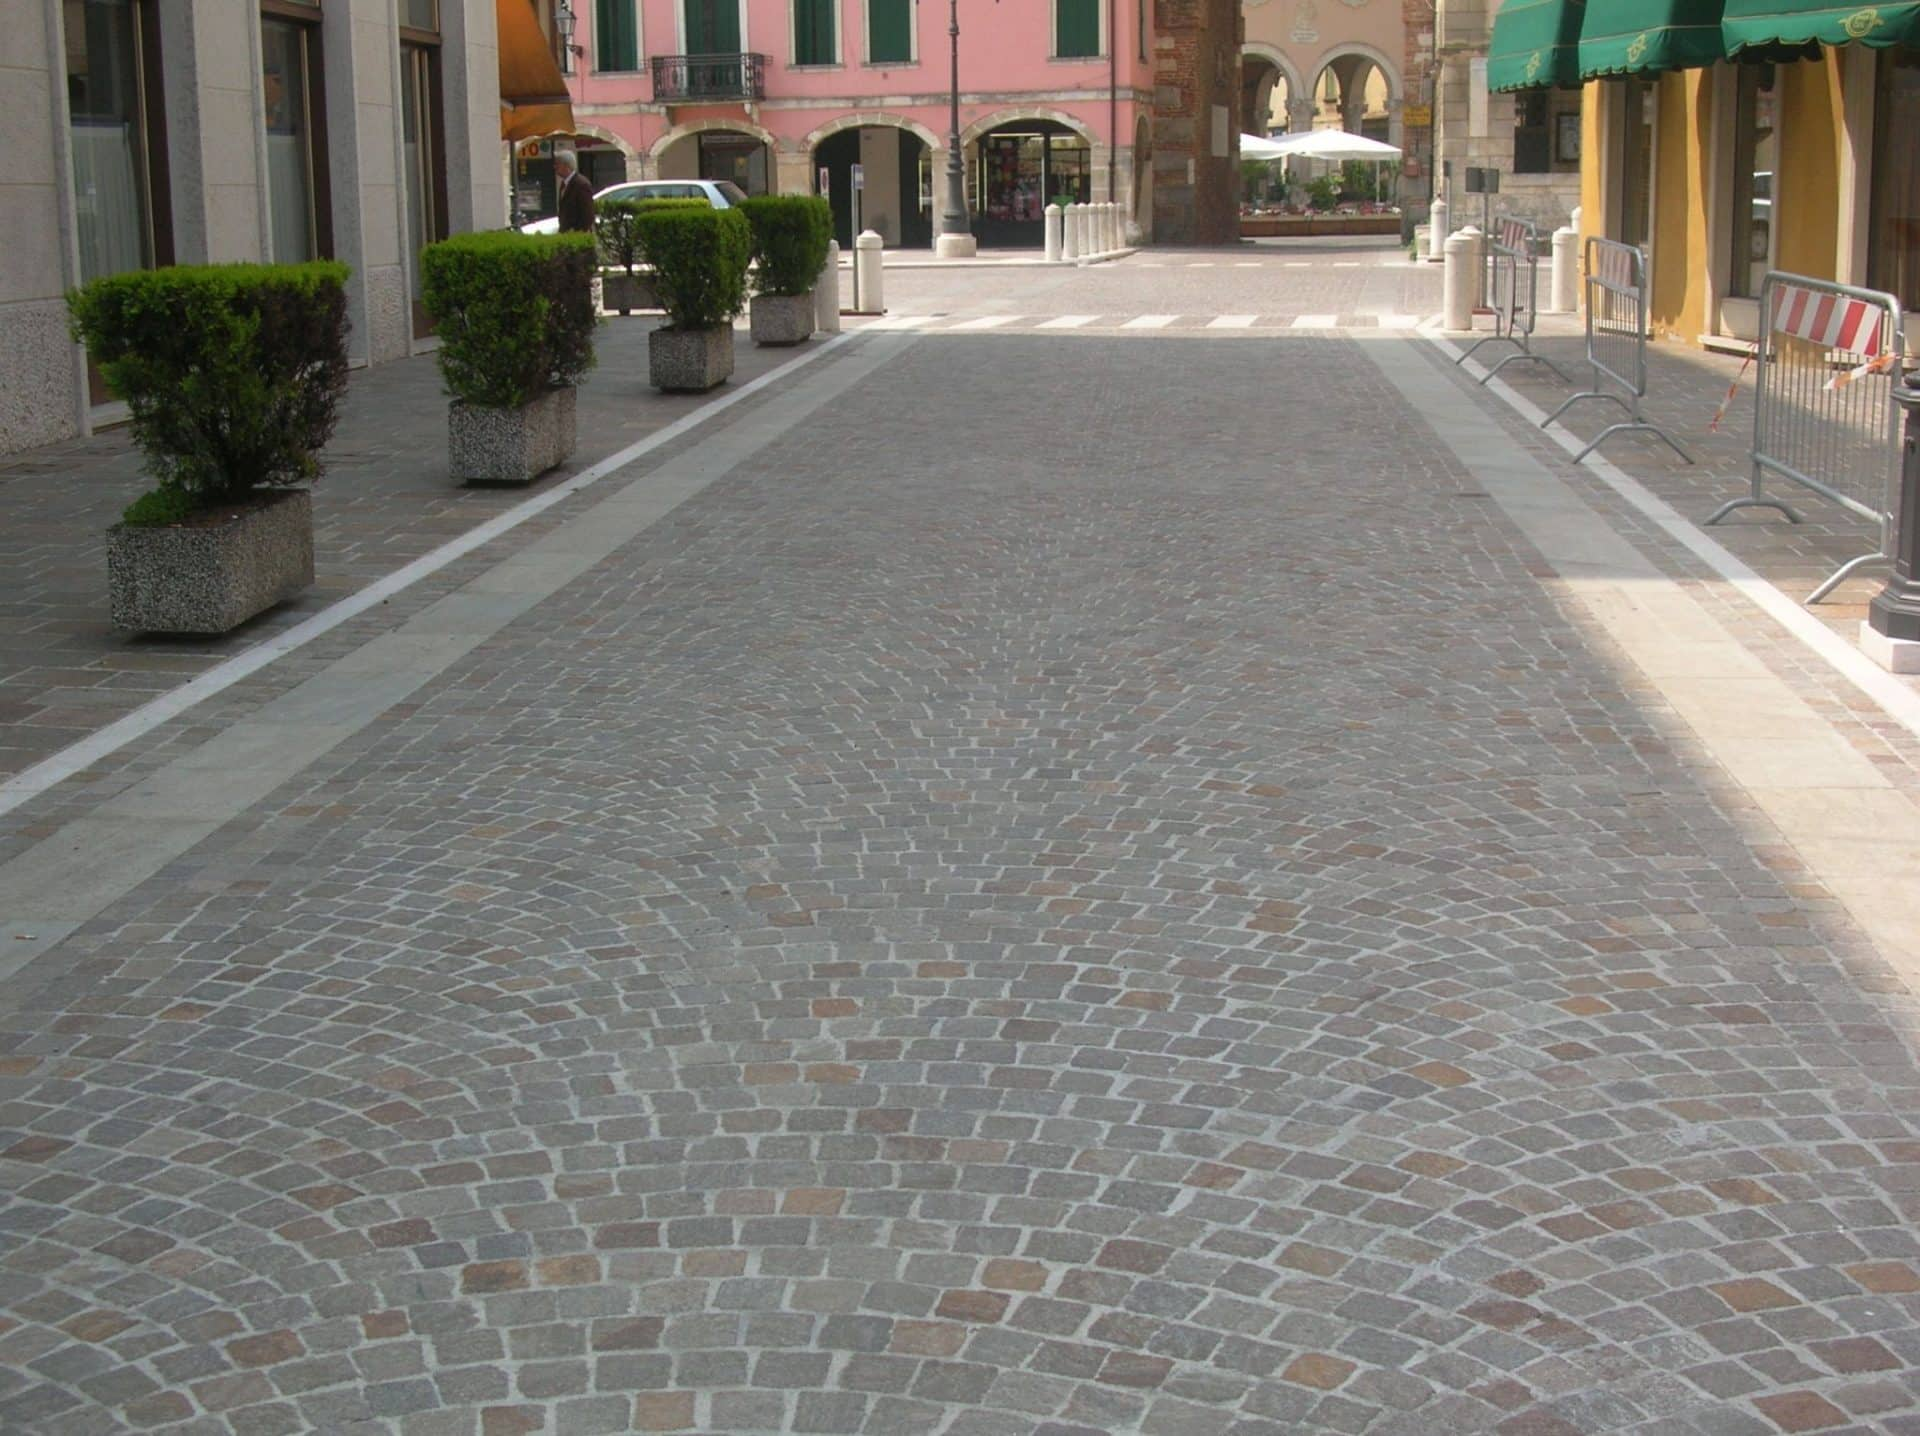 strada pubblica provincia verona